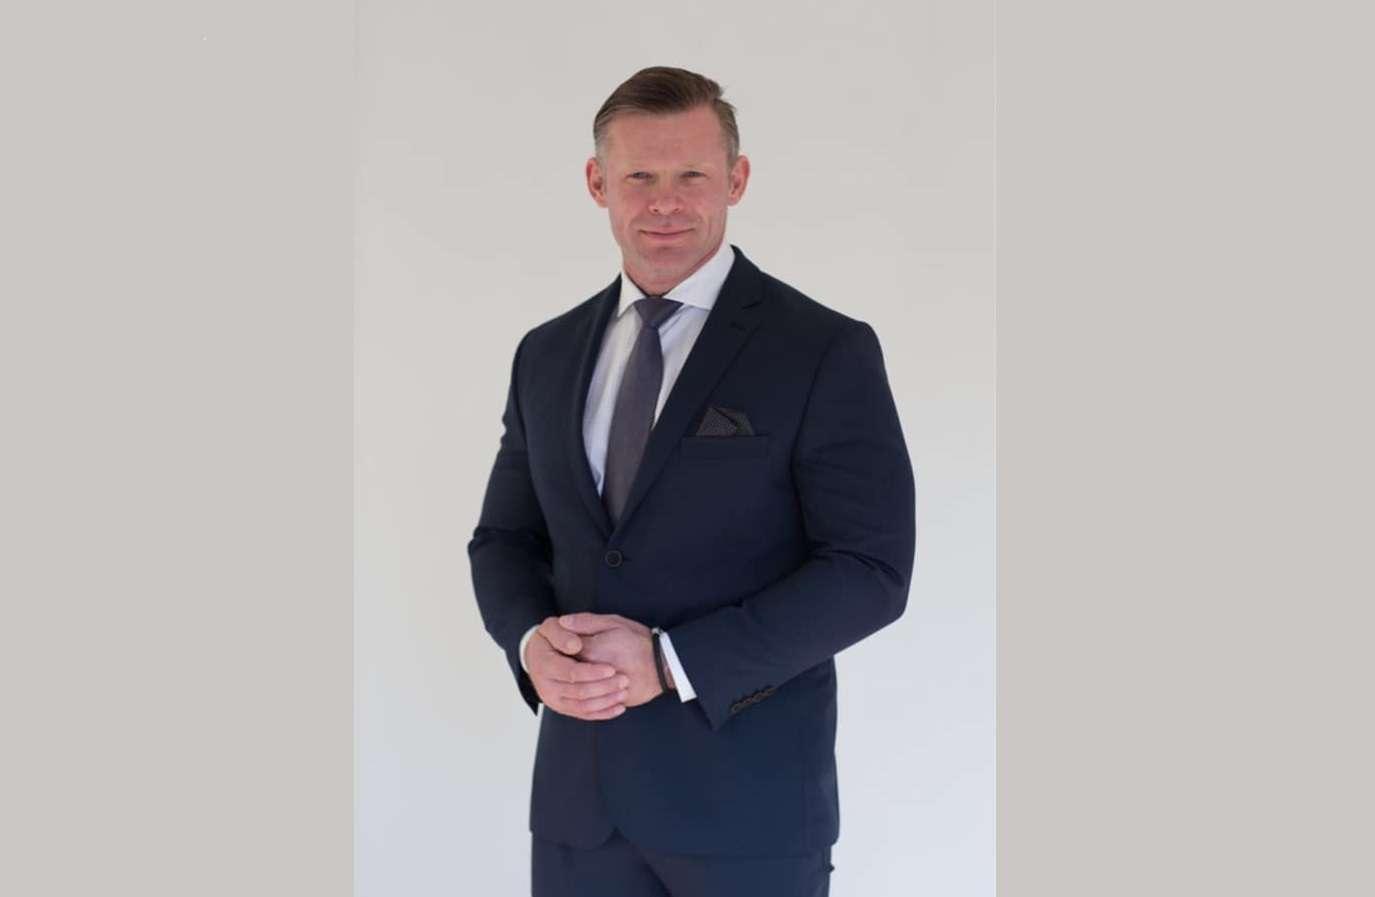 Candidato a legislador en Dinamarca, Joachim B. Olsen, Foto: Facebook